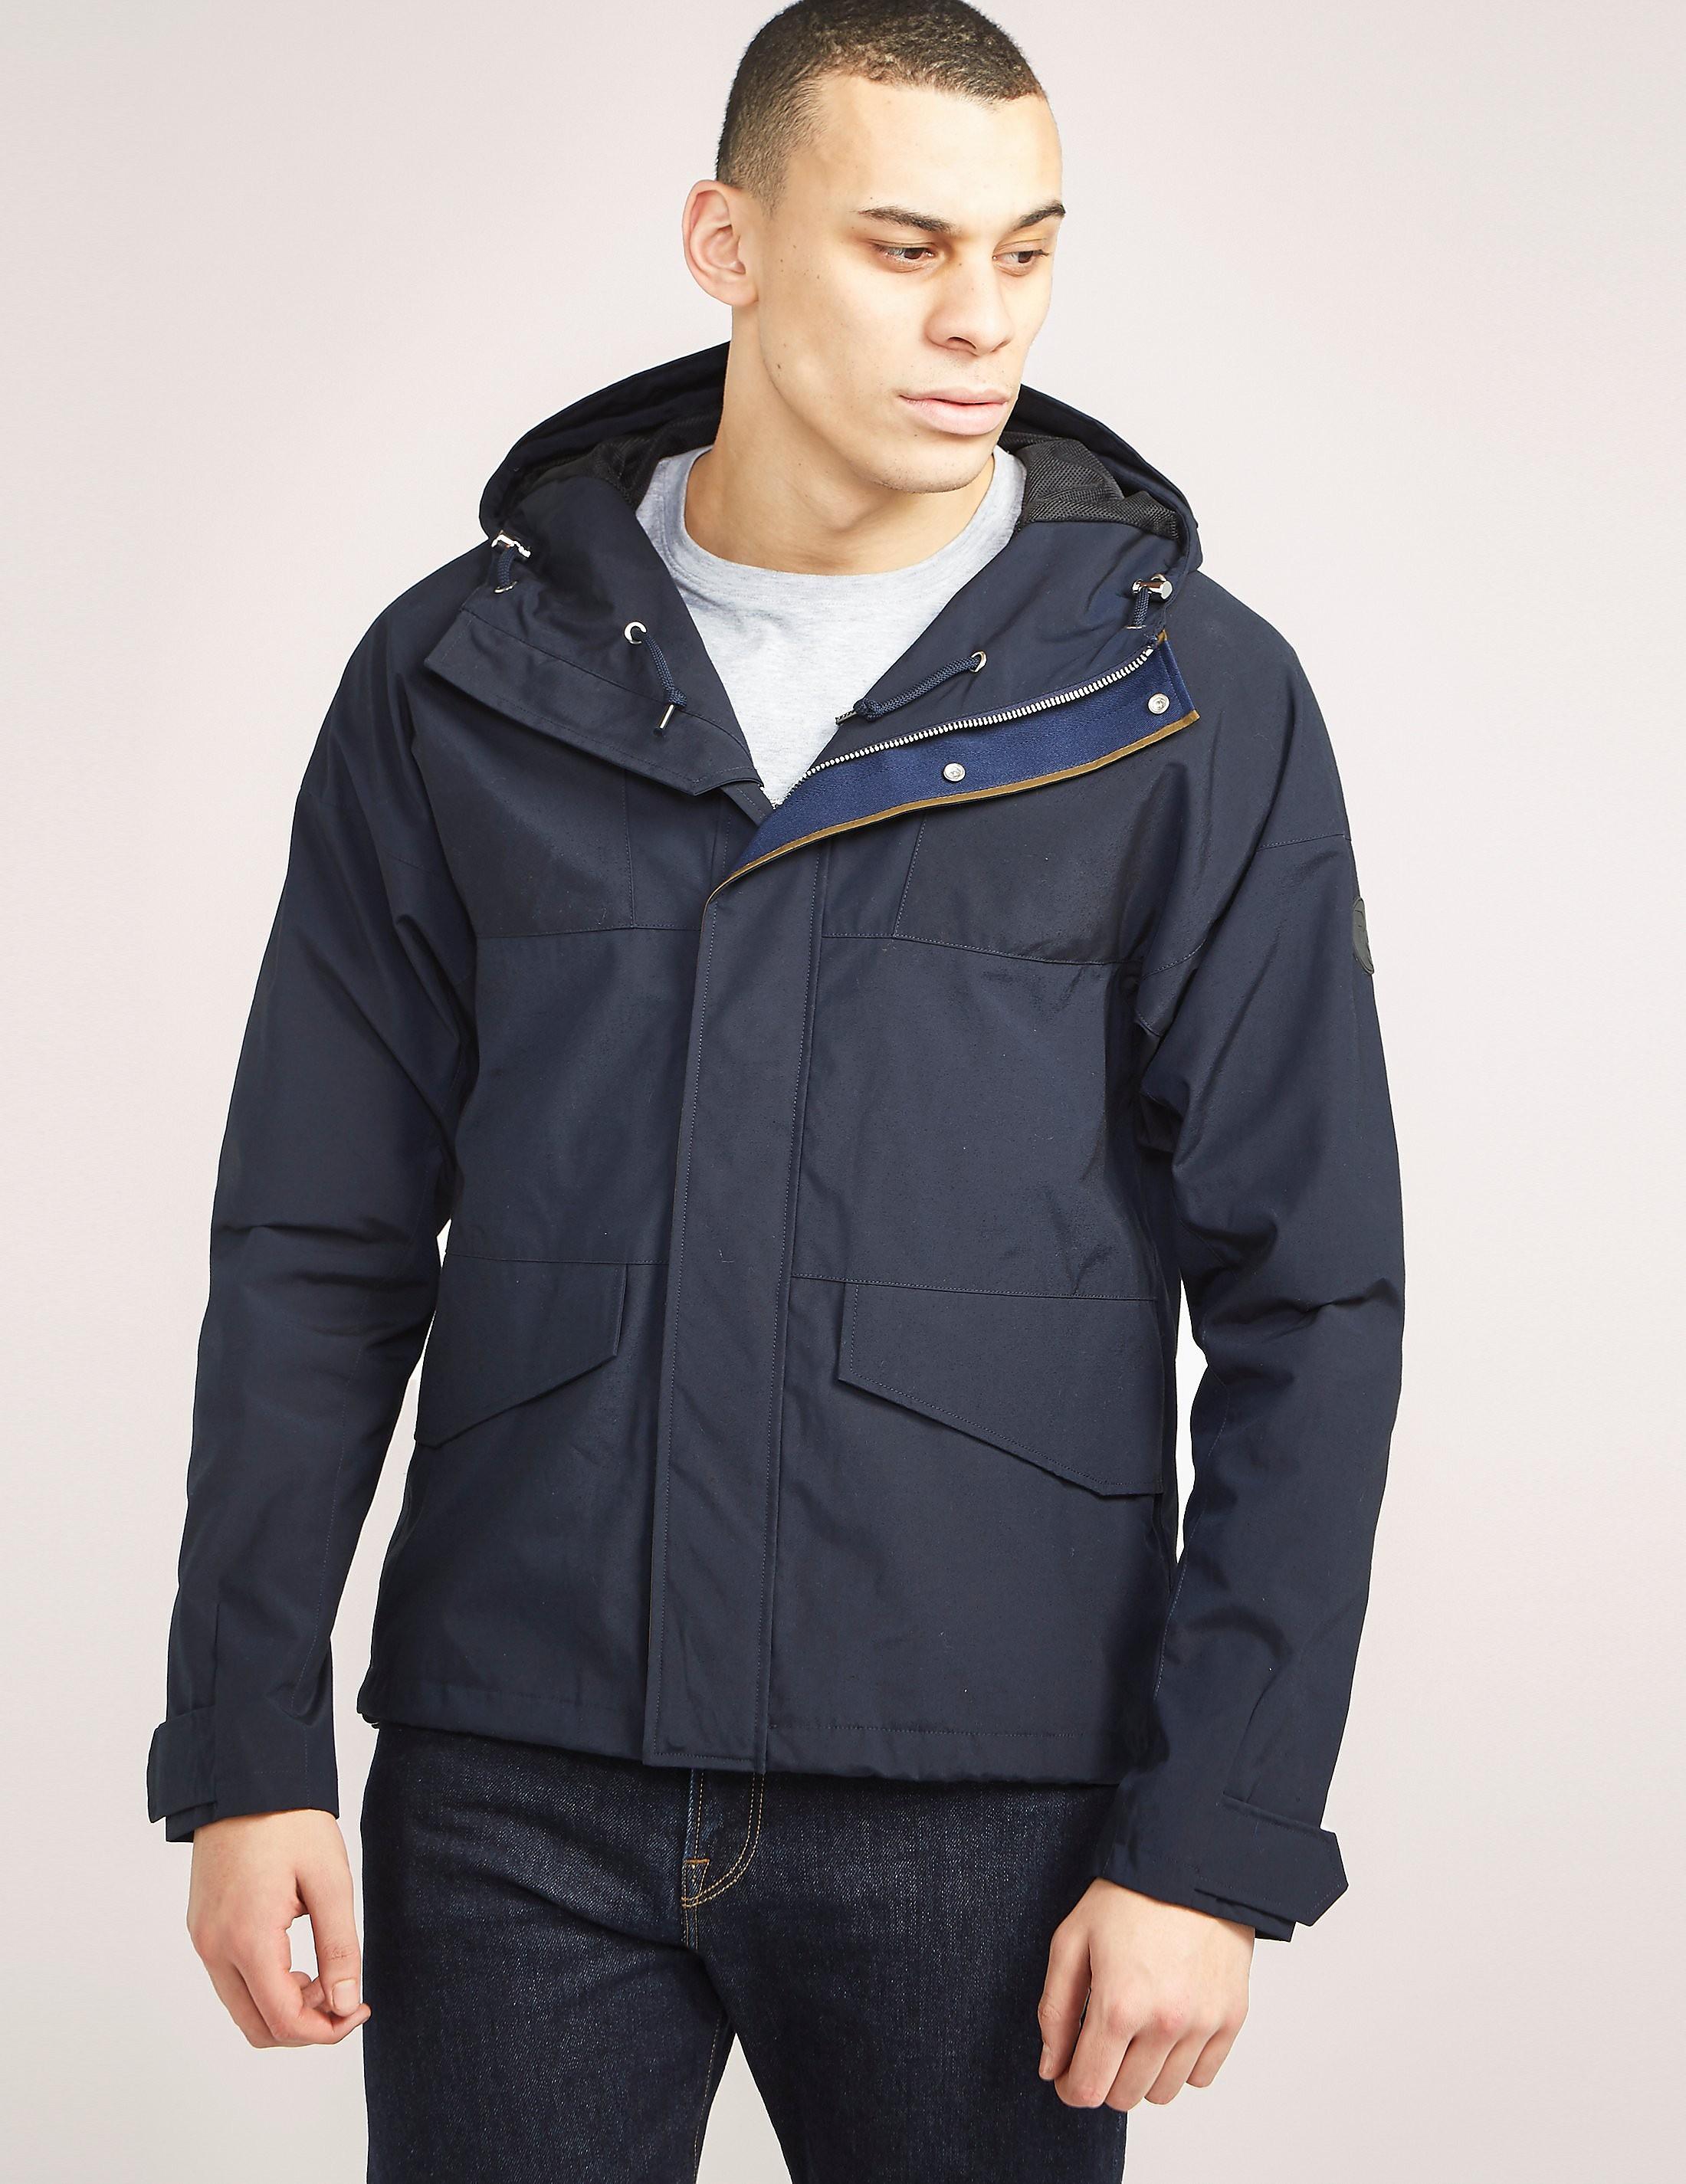 Paul Smith Polycotton Hooded Jacket